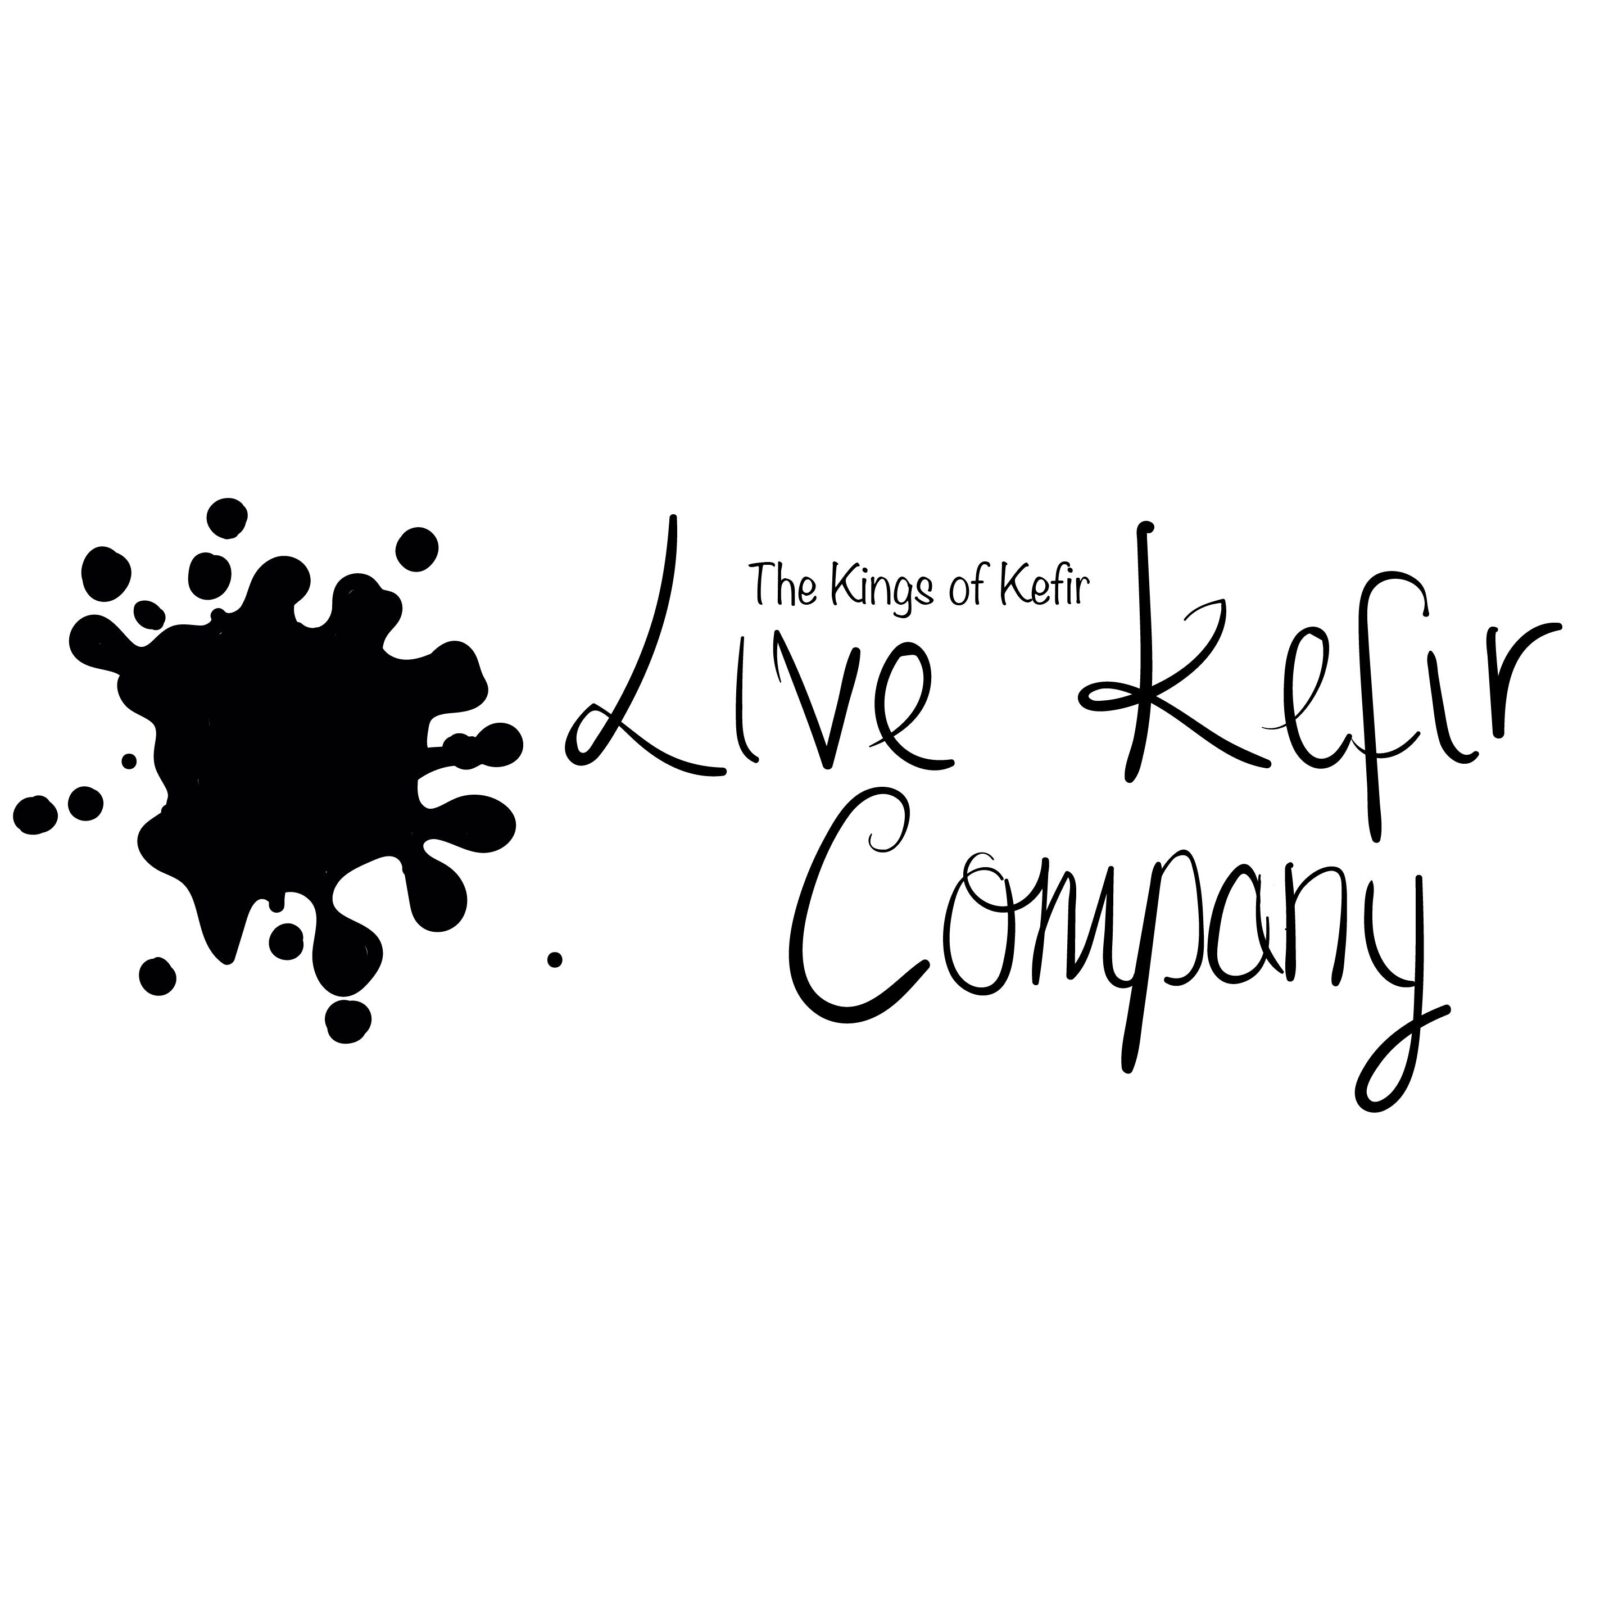 Live Kefir Company logo